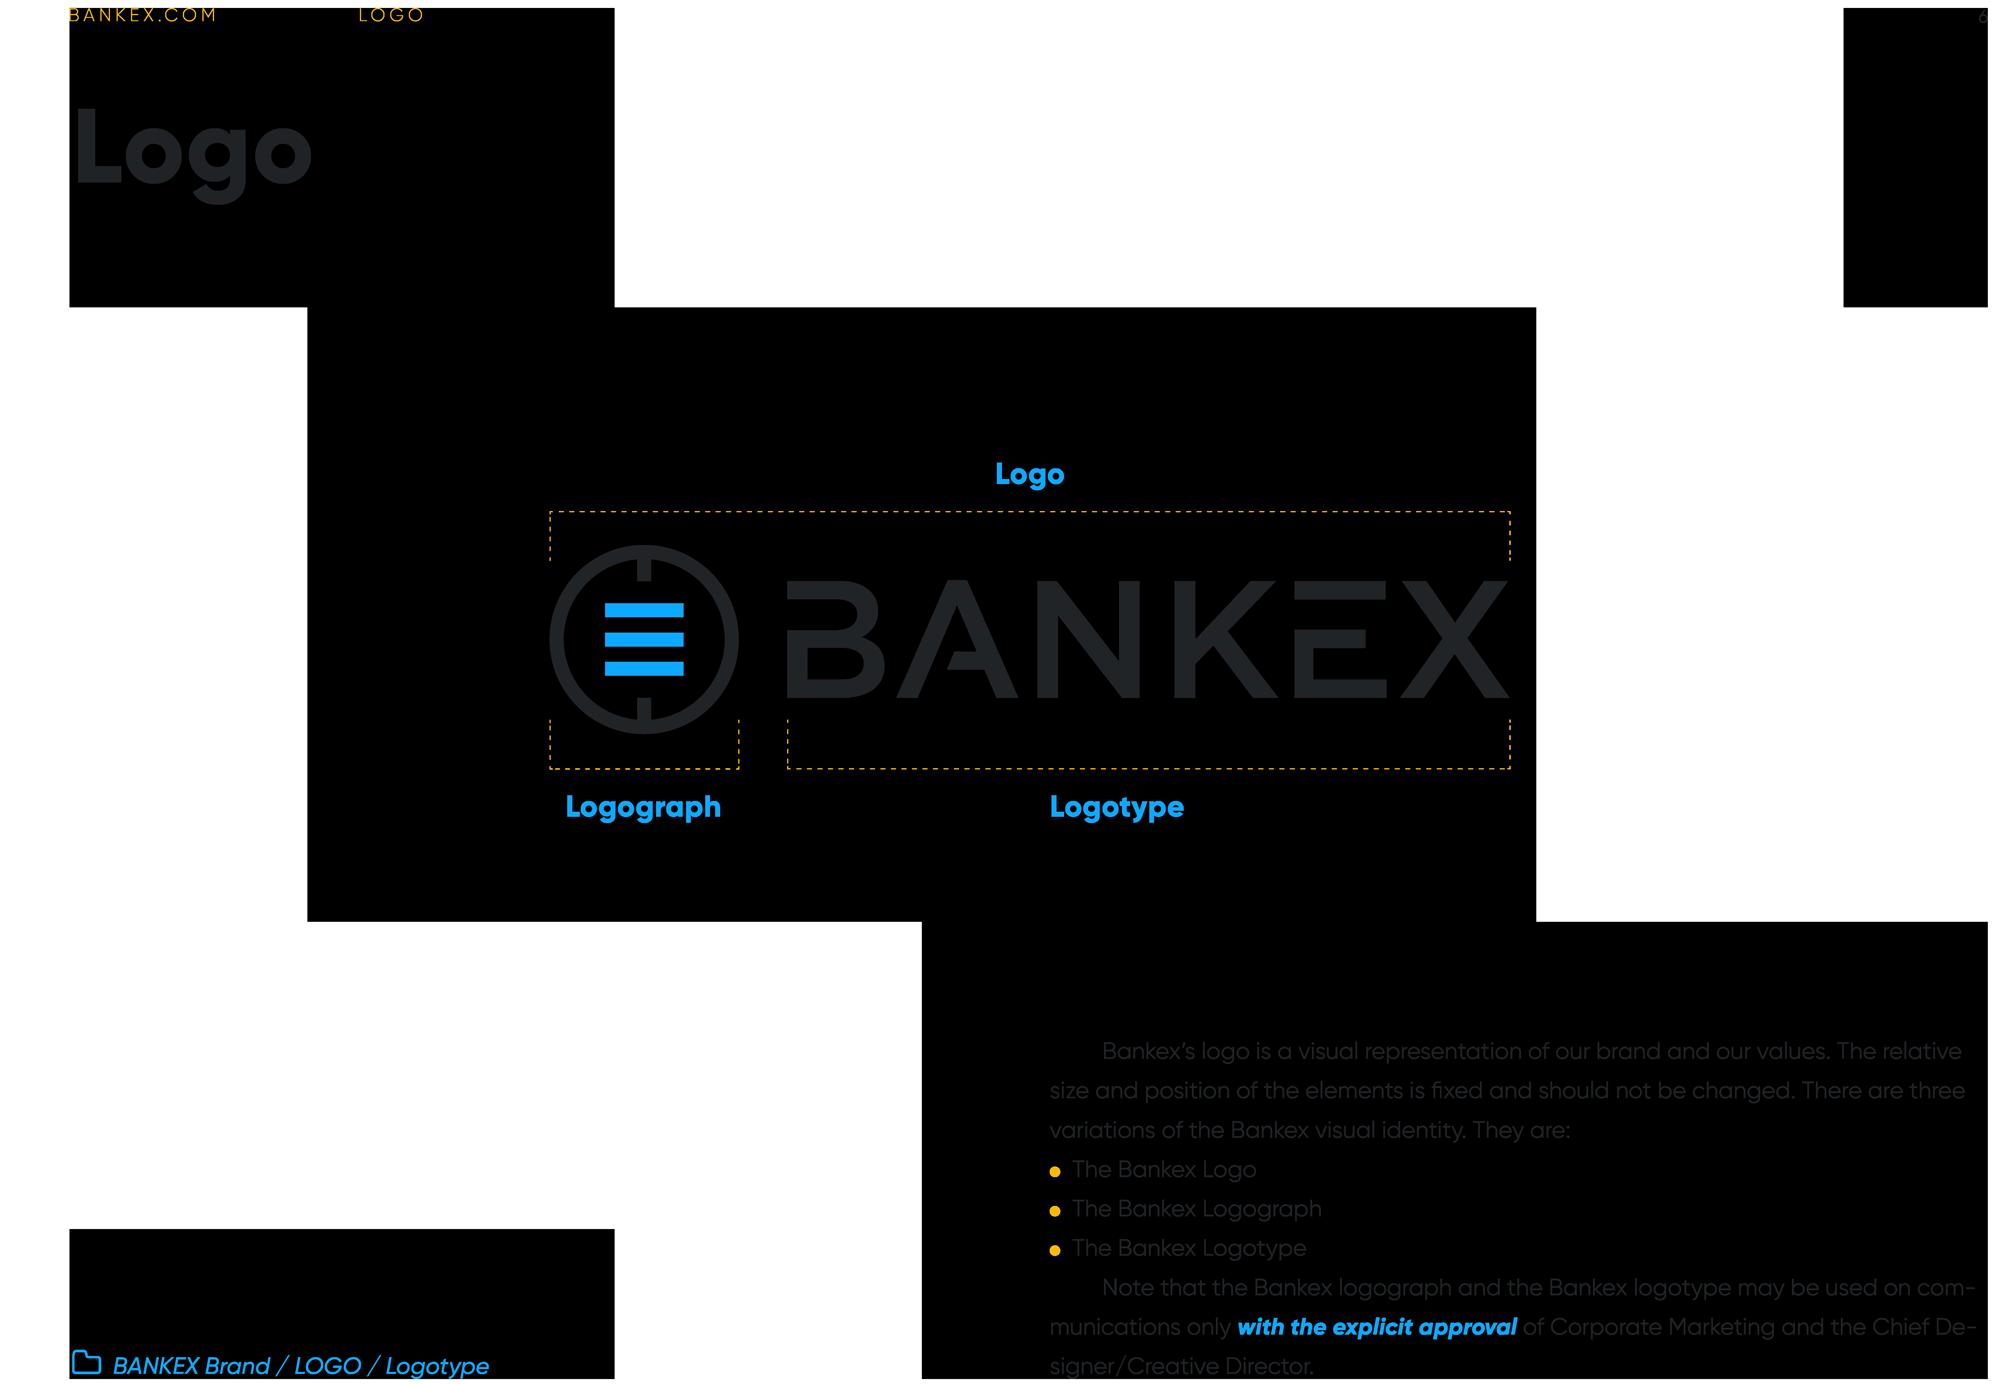 bankex_brandook_web-6.png